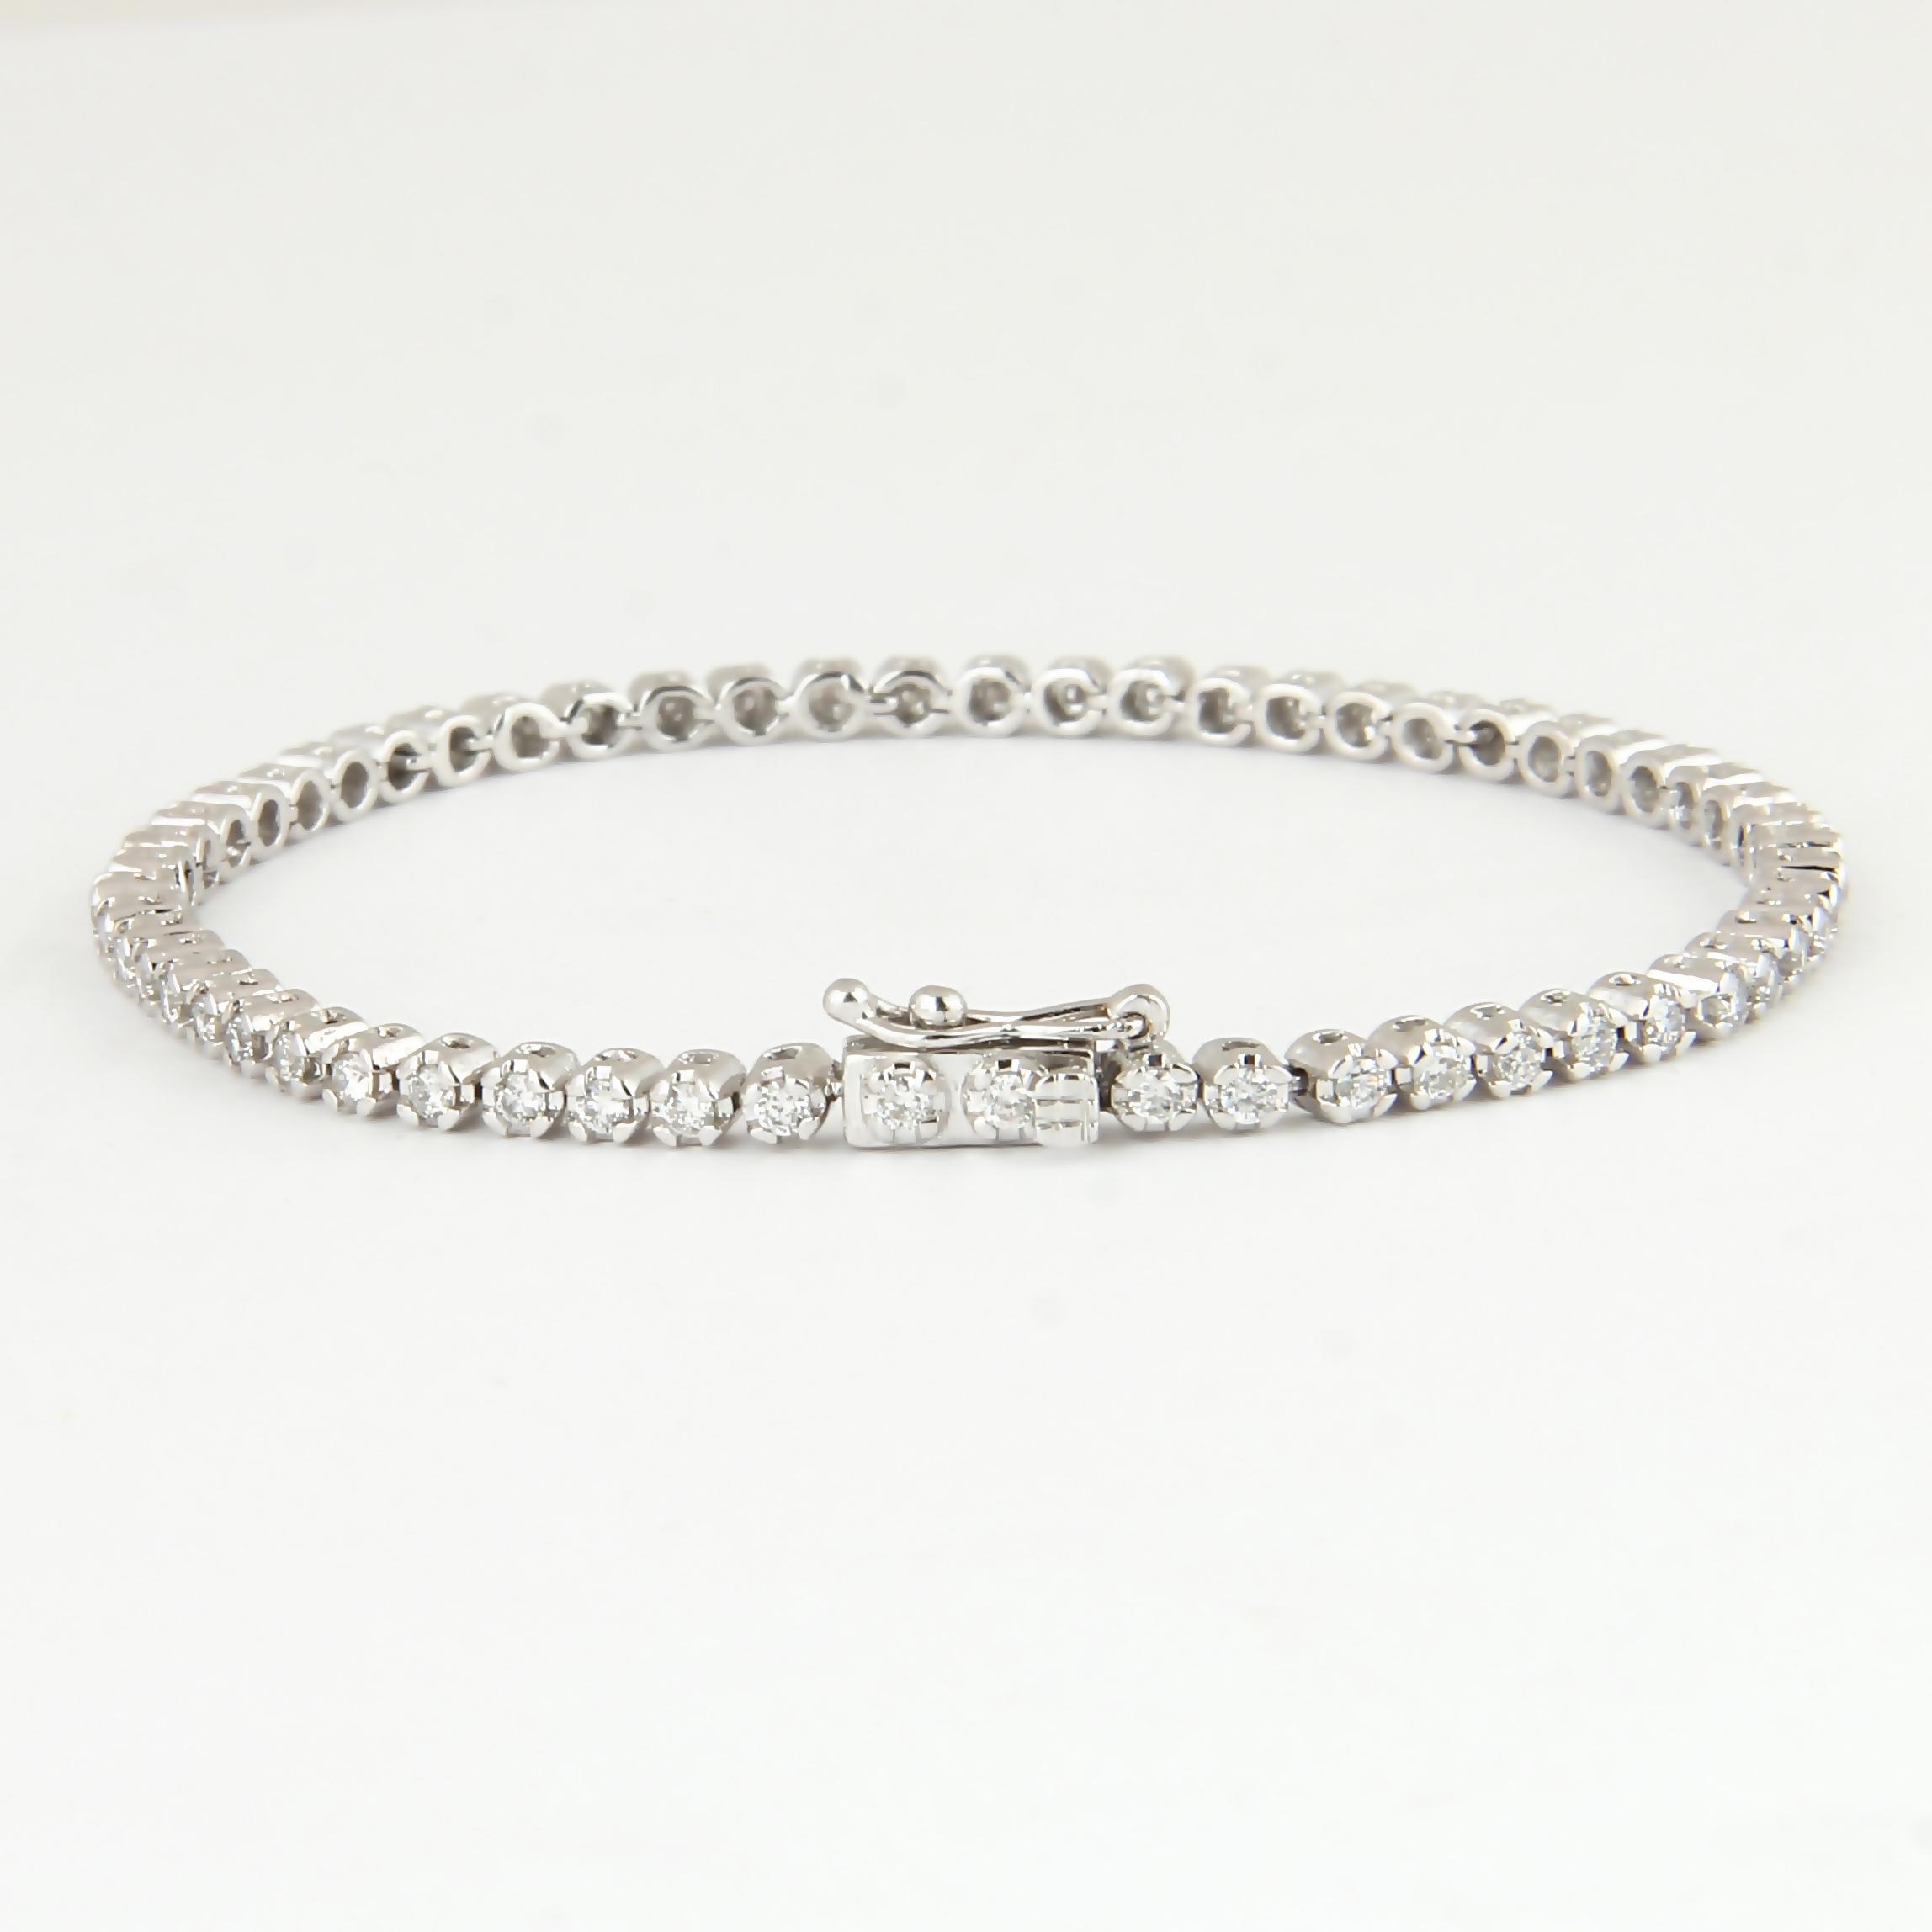 Lot 37 - 14 K / 585 White Gold Tennis Bracelet with Diamonds